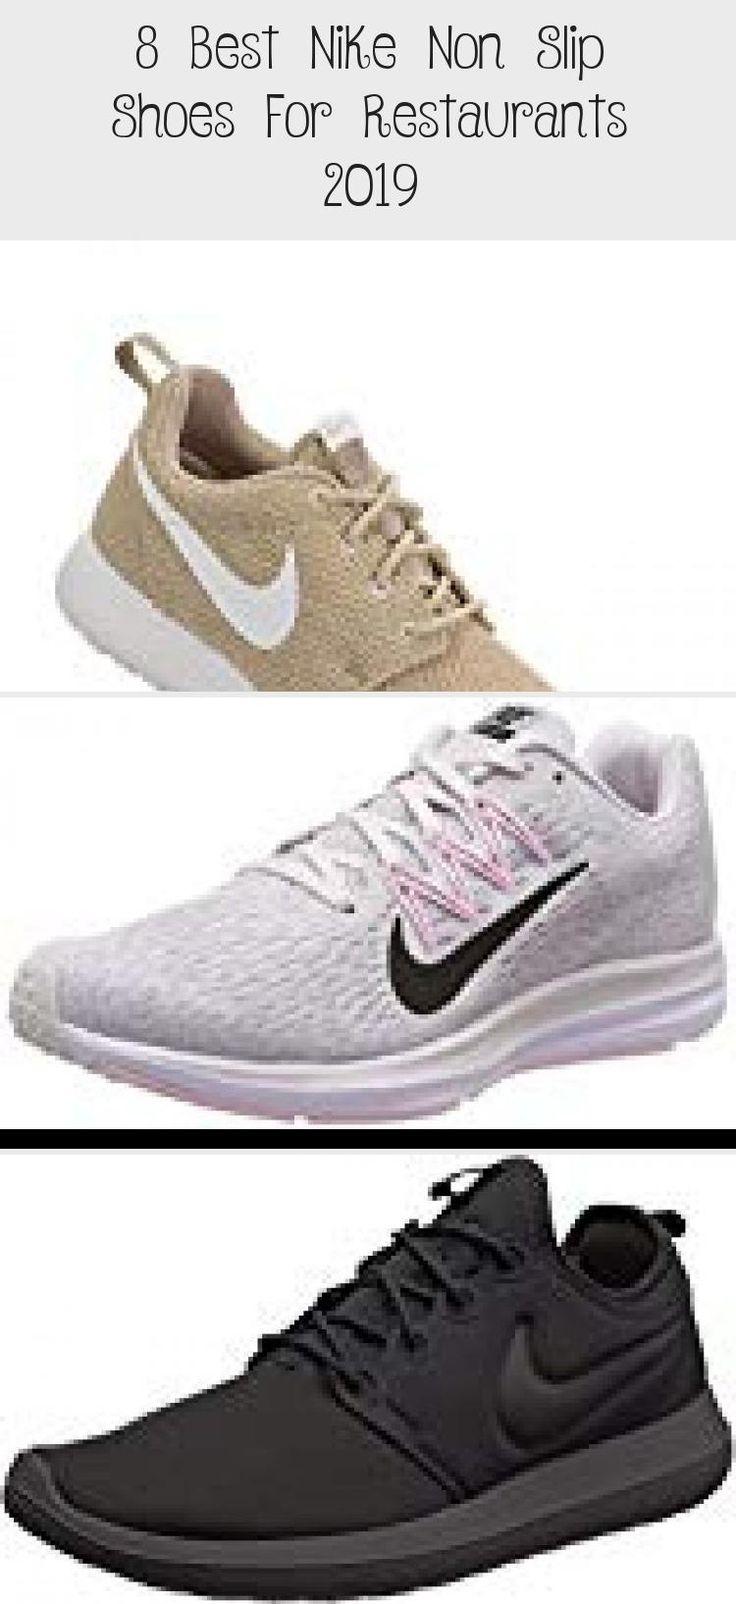 Best Nike Non Slip Shoes